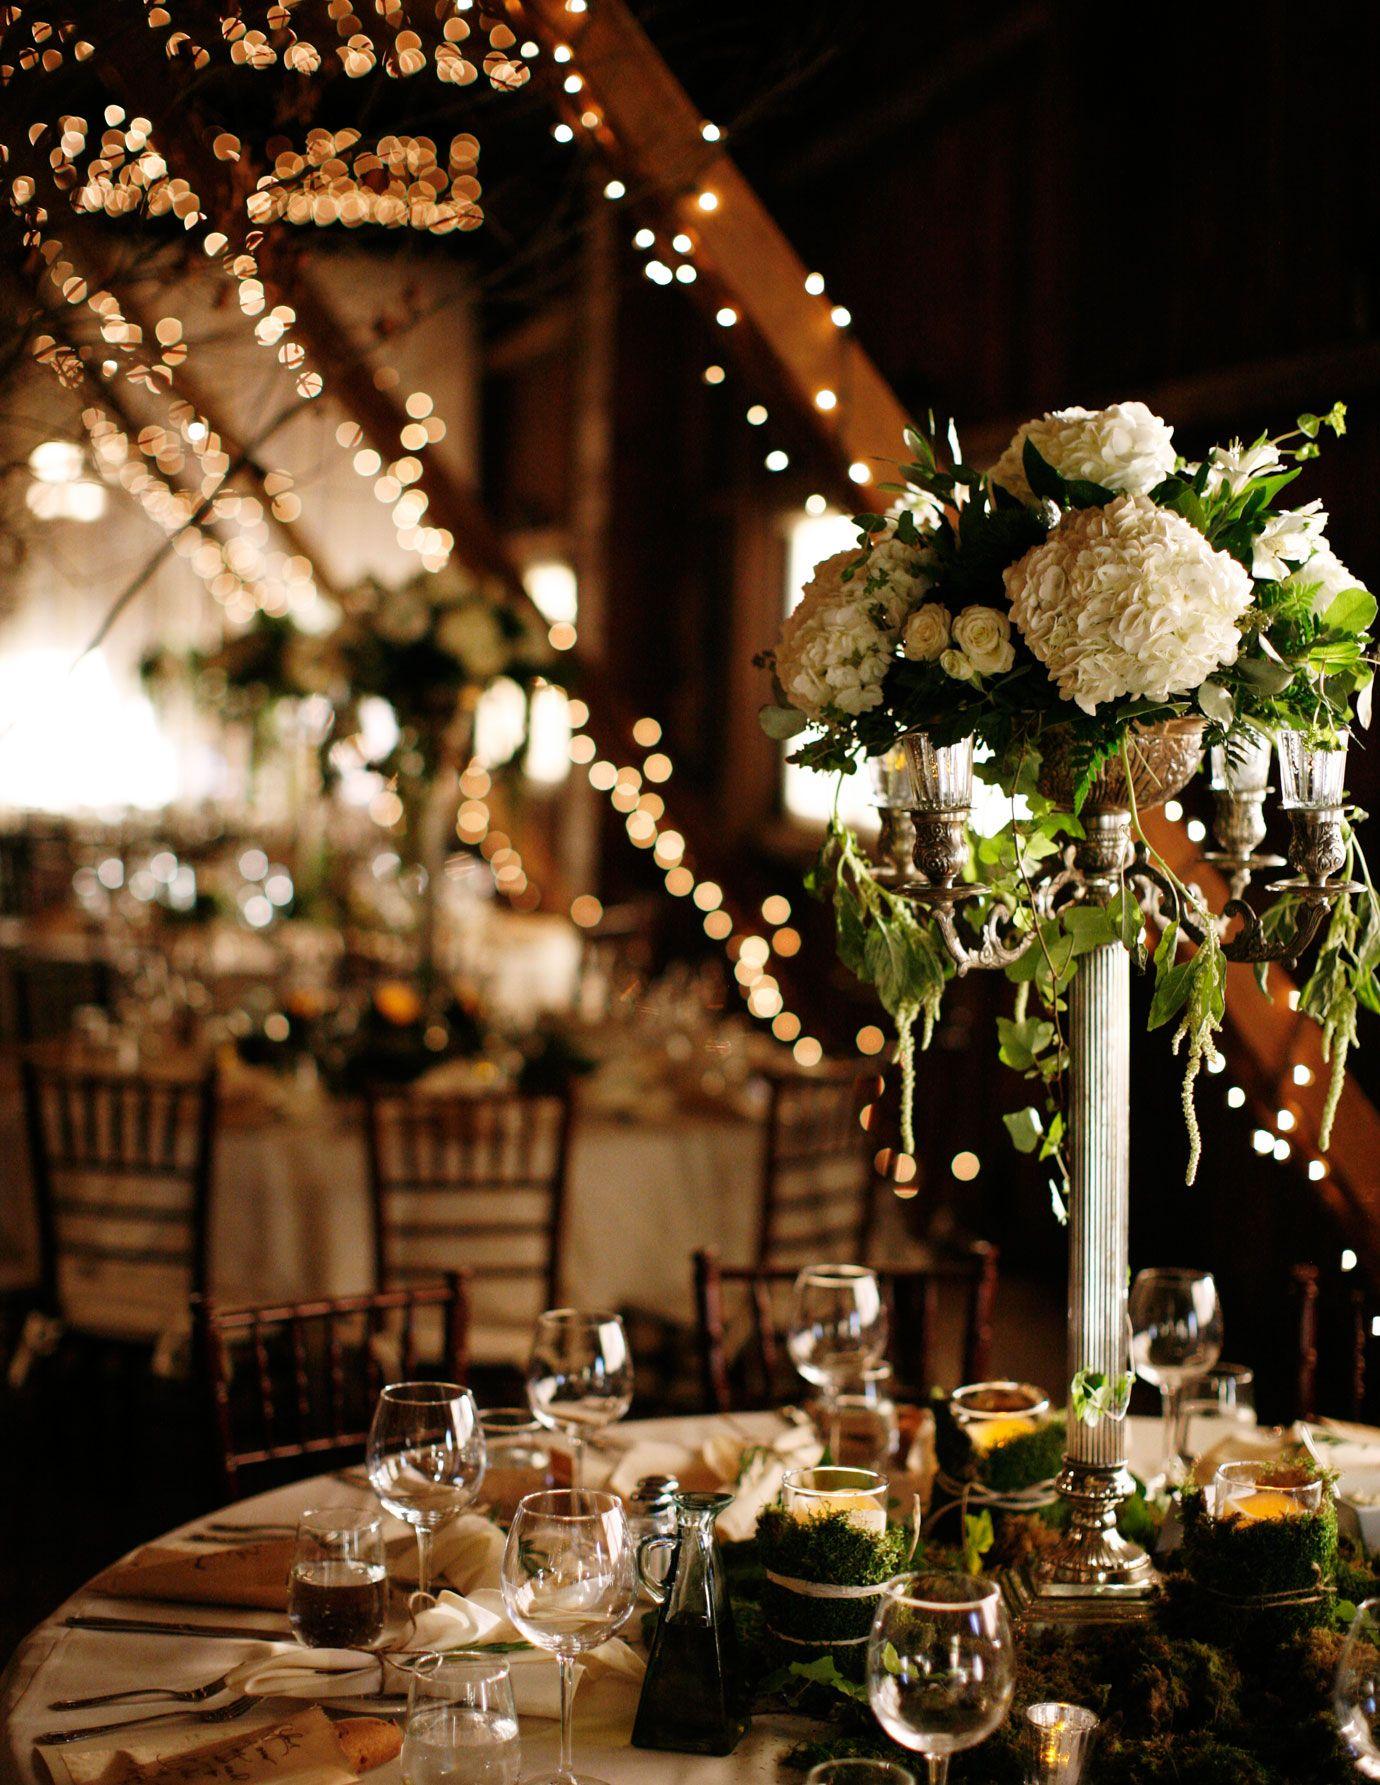 Fall Farm Wedding Ideas - Friedman Farms PA Wedding Pictures - Town & Country